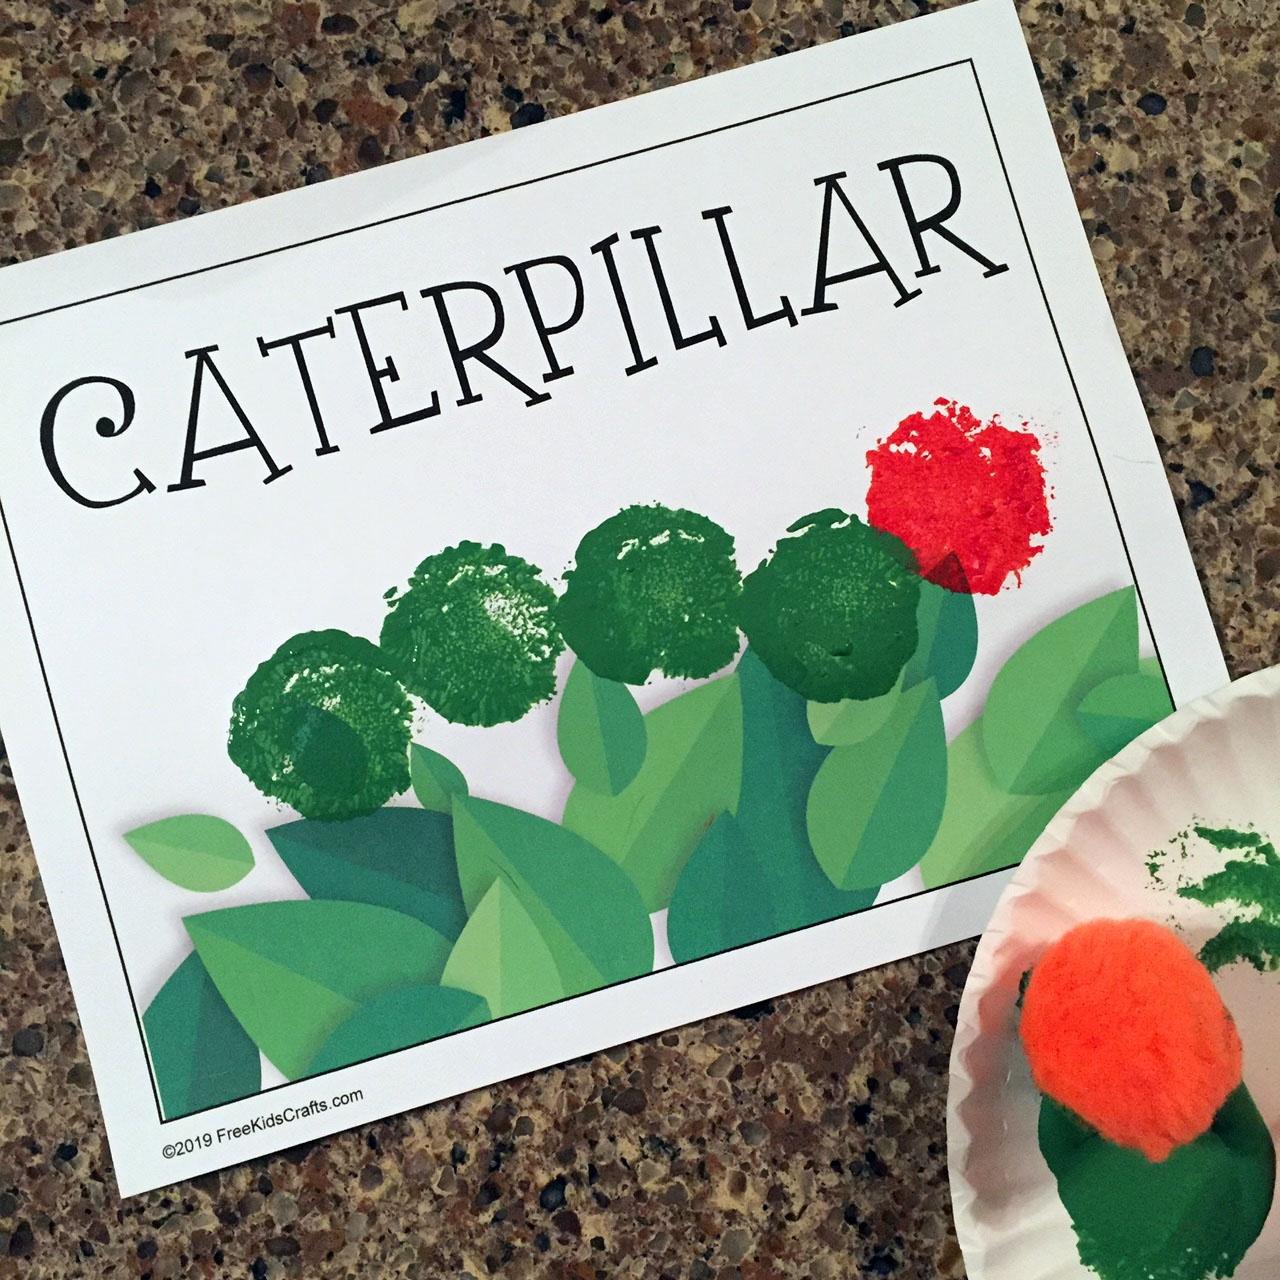 Easy pompom caterpillar craft for preschoolers